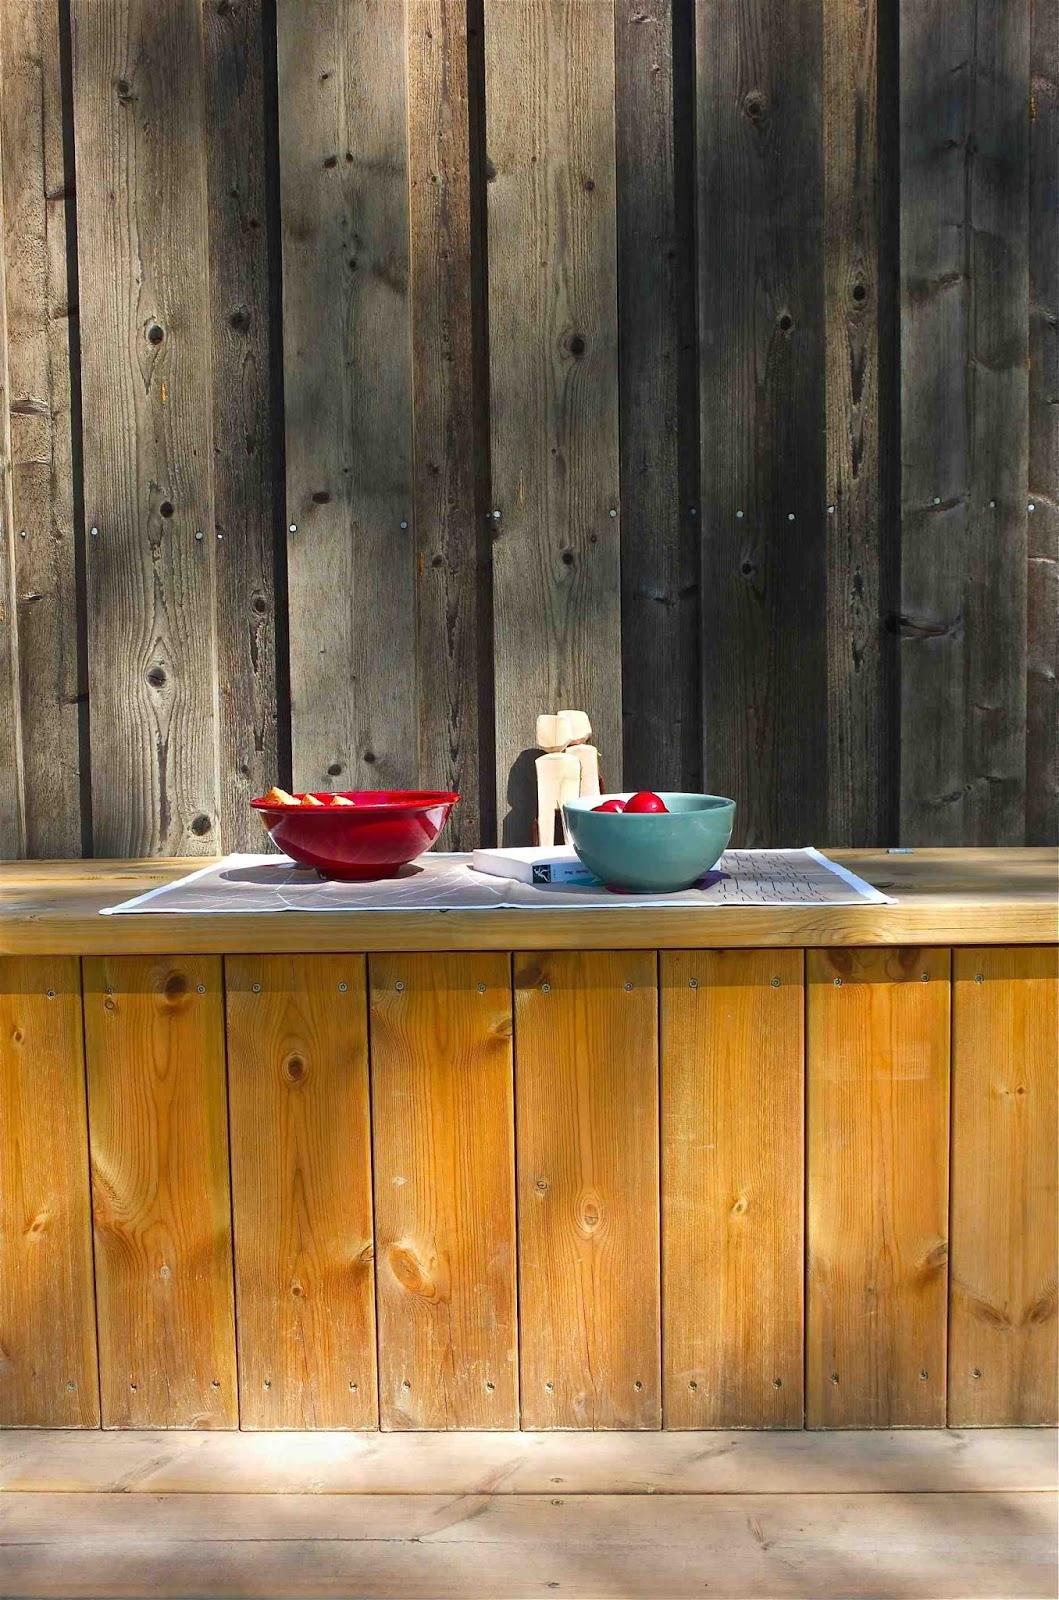 slavia vintage le blog de l 39 est design d co et lifestyle lavmi design slavo scandinave. Black Bedroom Furniture Sets. Home Design Ideas